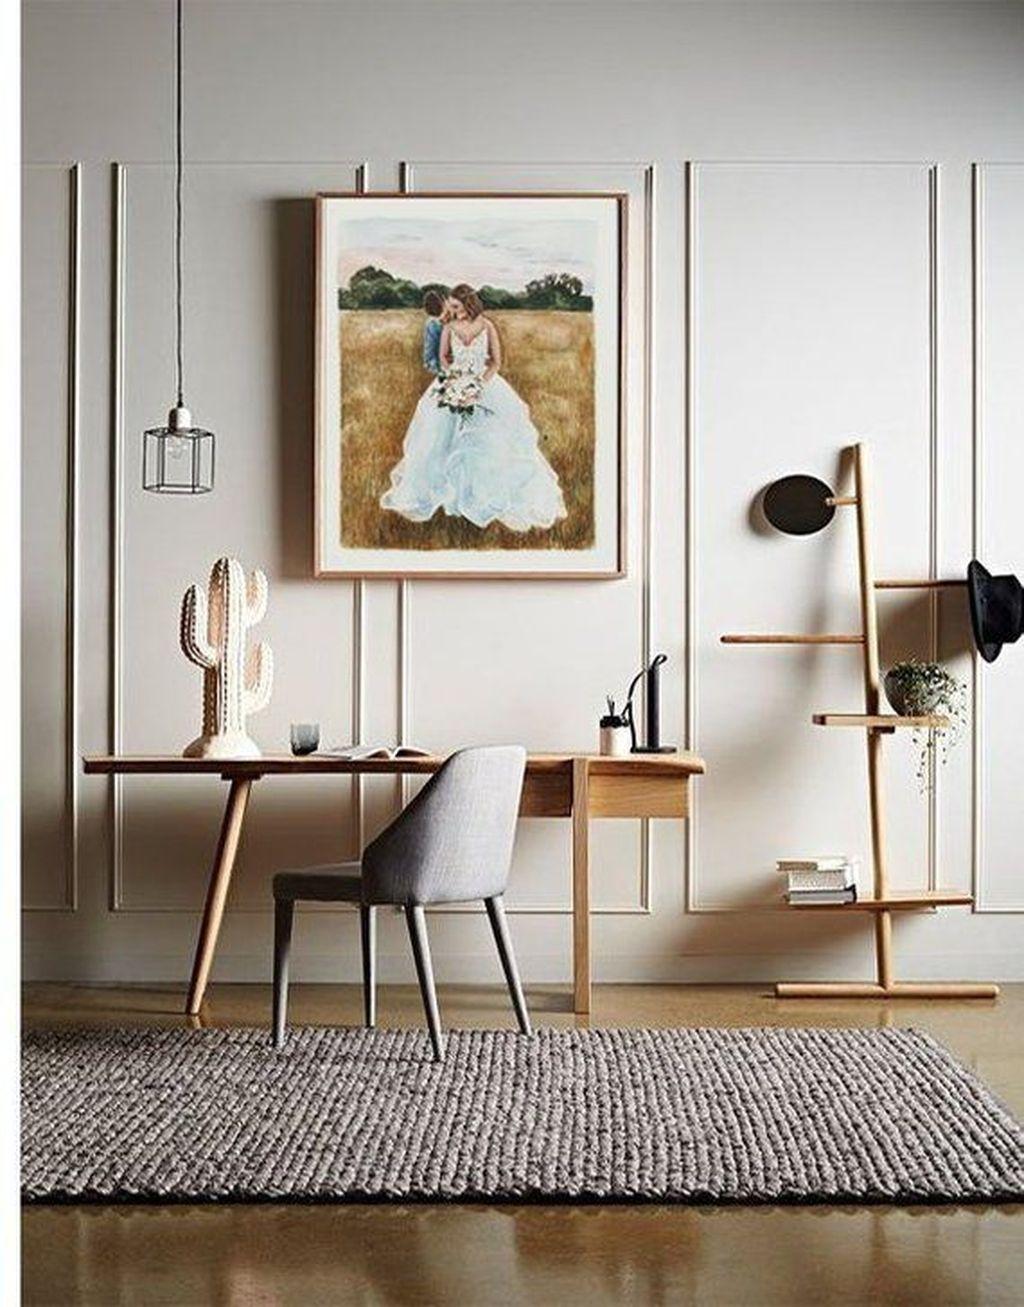 The Best Office Artwork Design Ideas 16